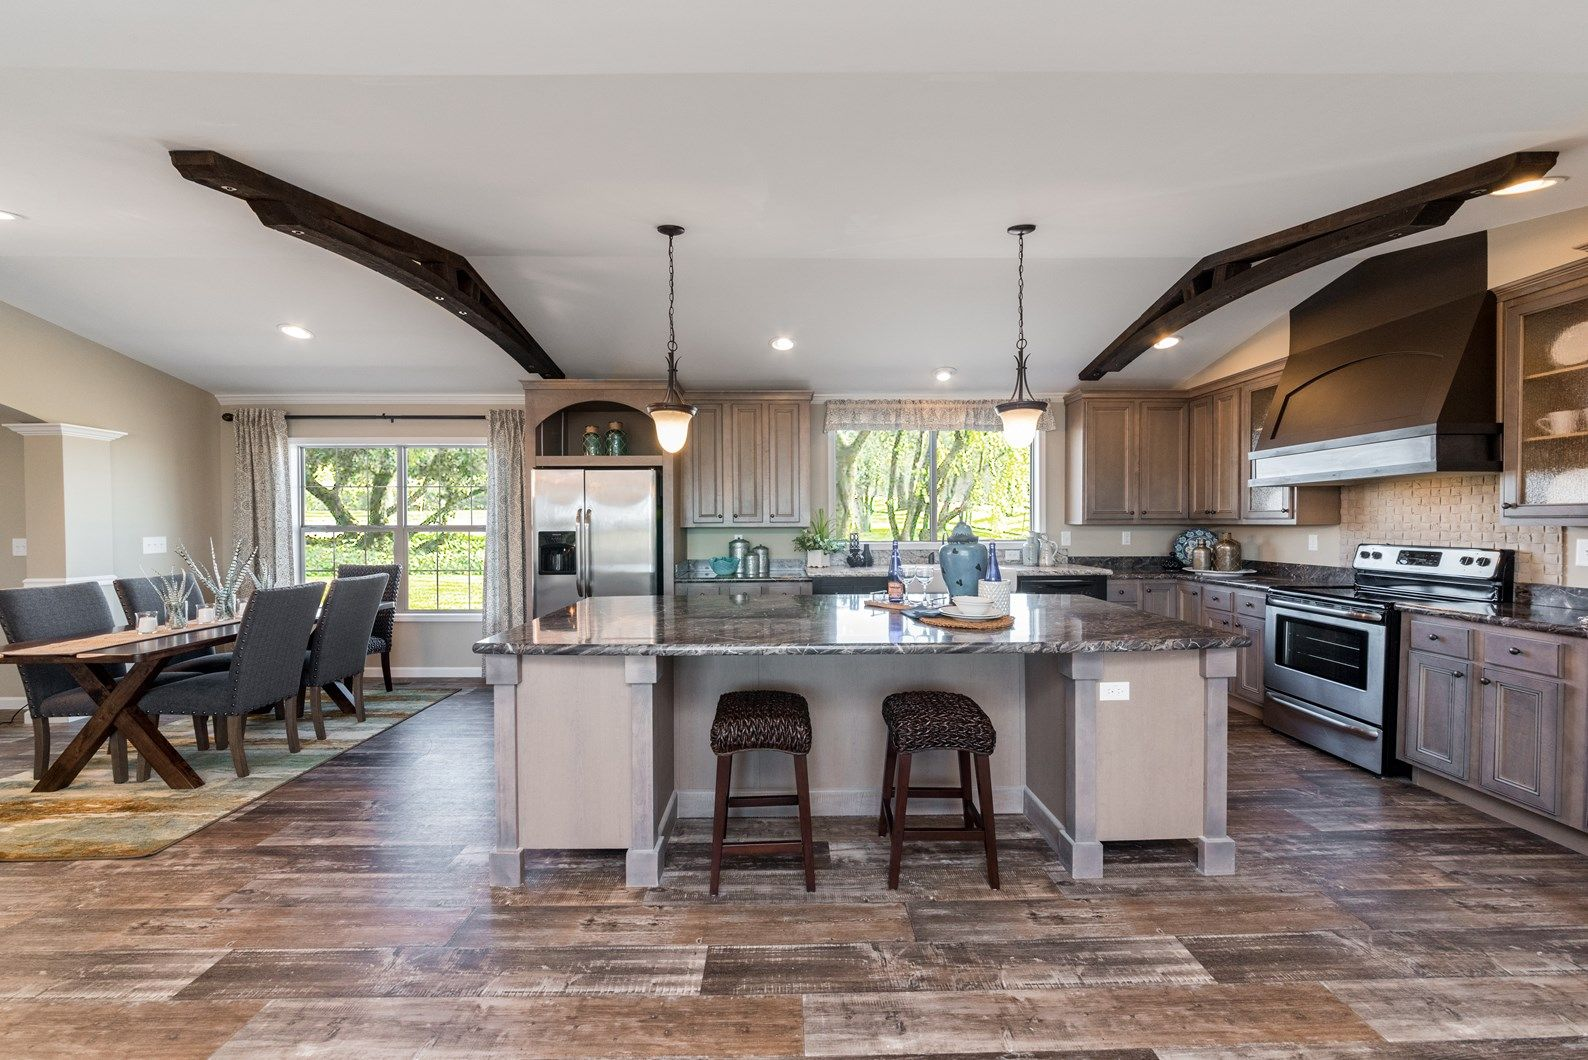 3D Tour Home, Clayton homes, Modular homes